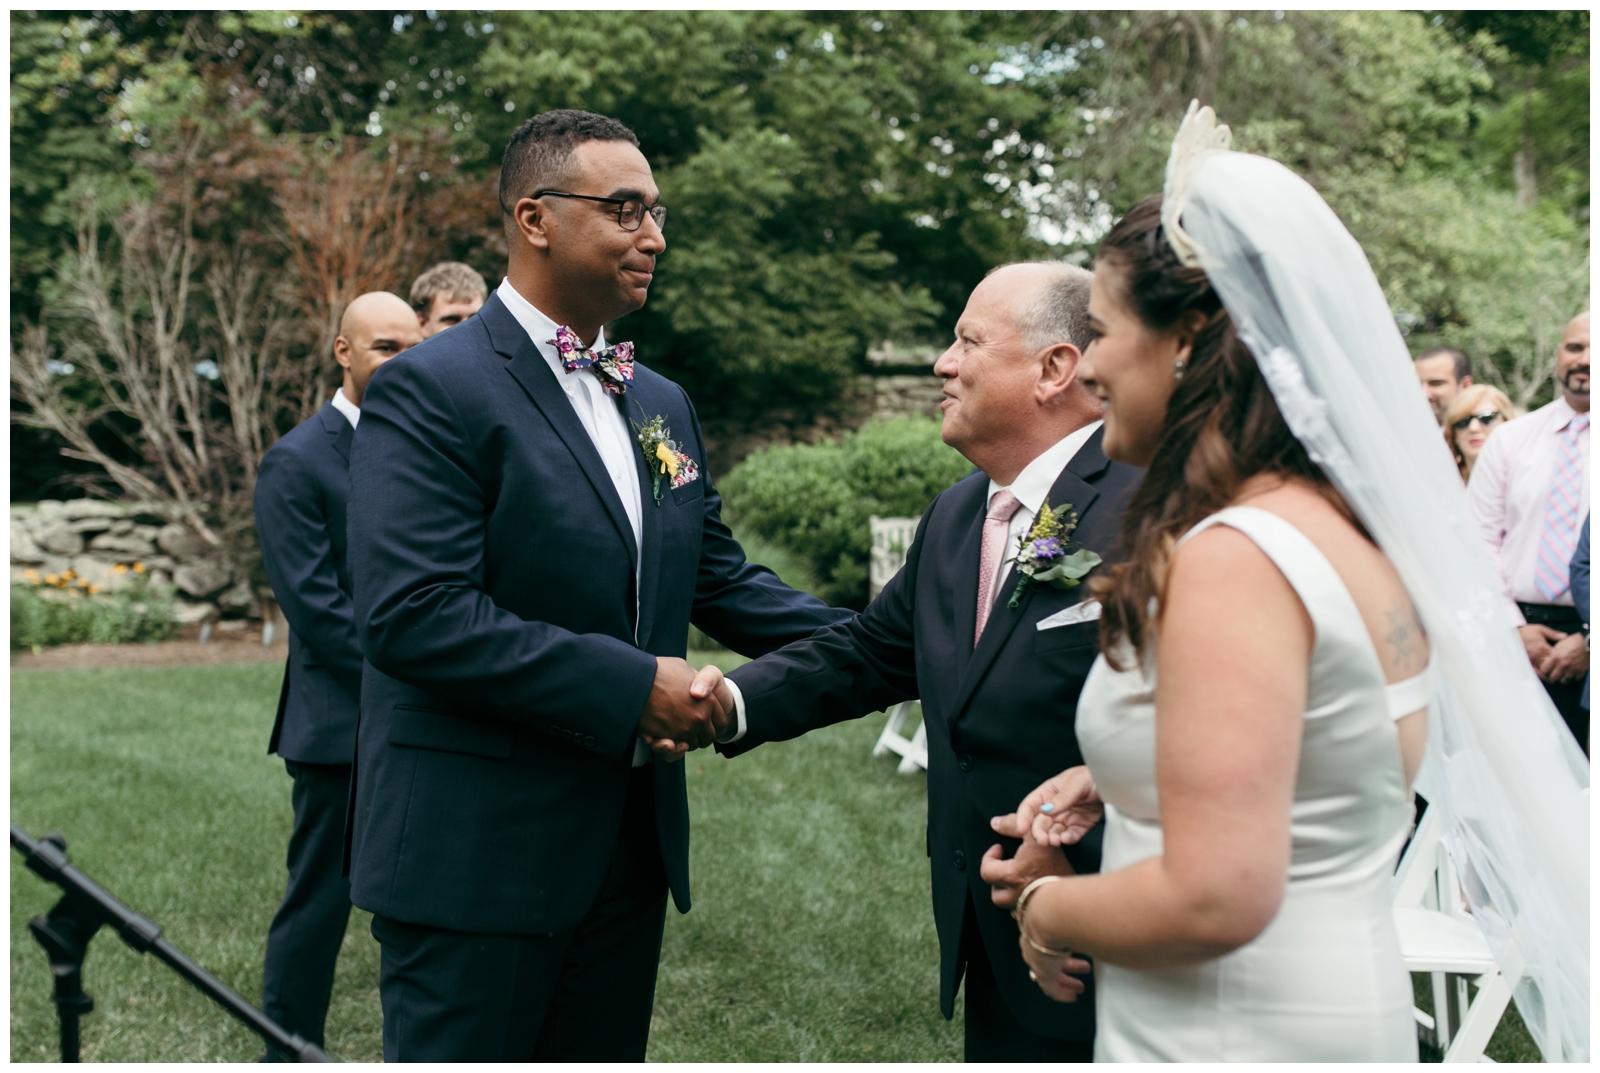 Bailey-Q-Photo-Connors-Center-Wedding-Boston-Wedding-Photographer-044.jpg